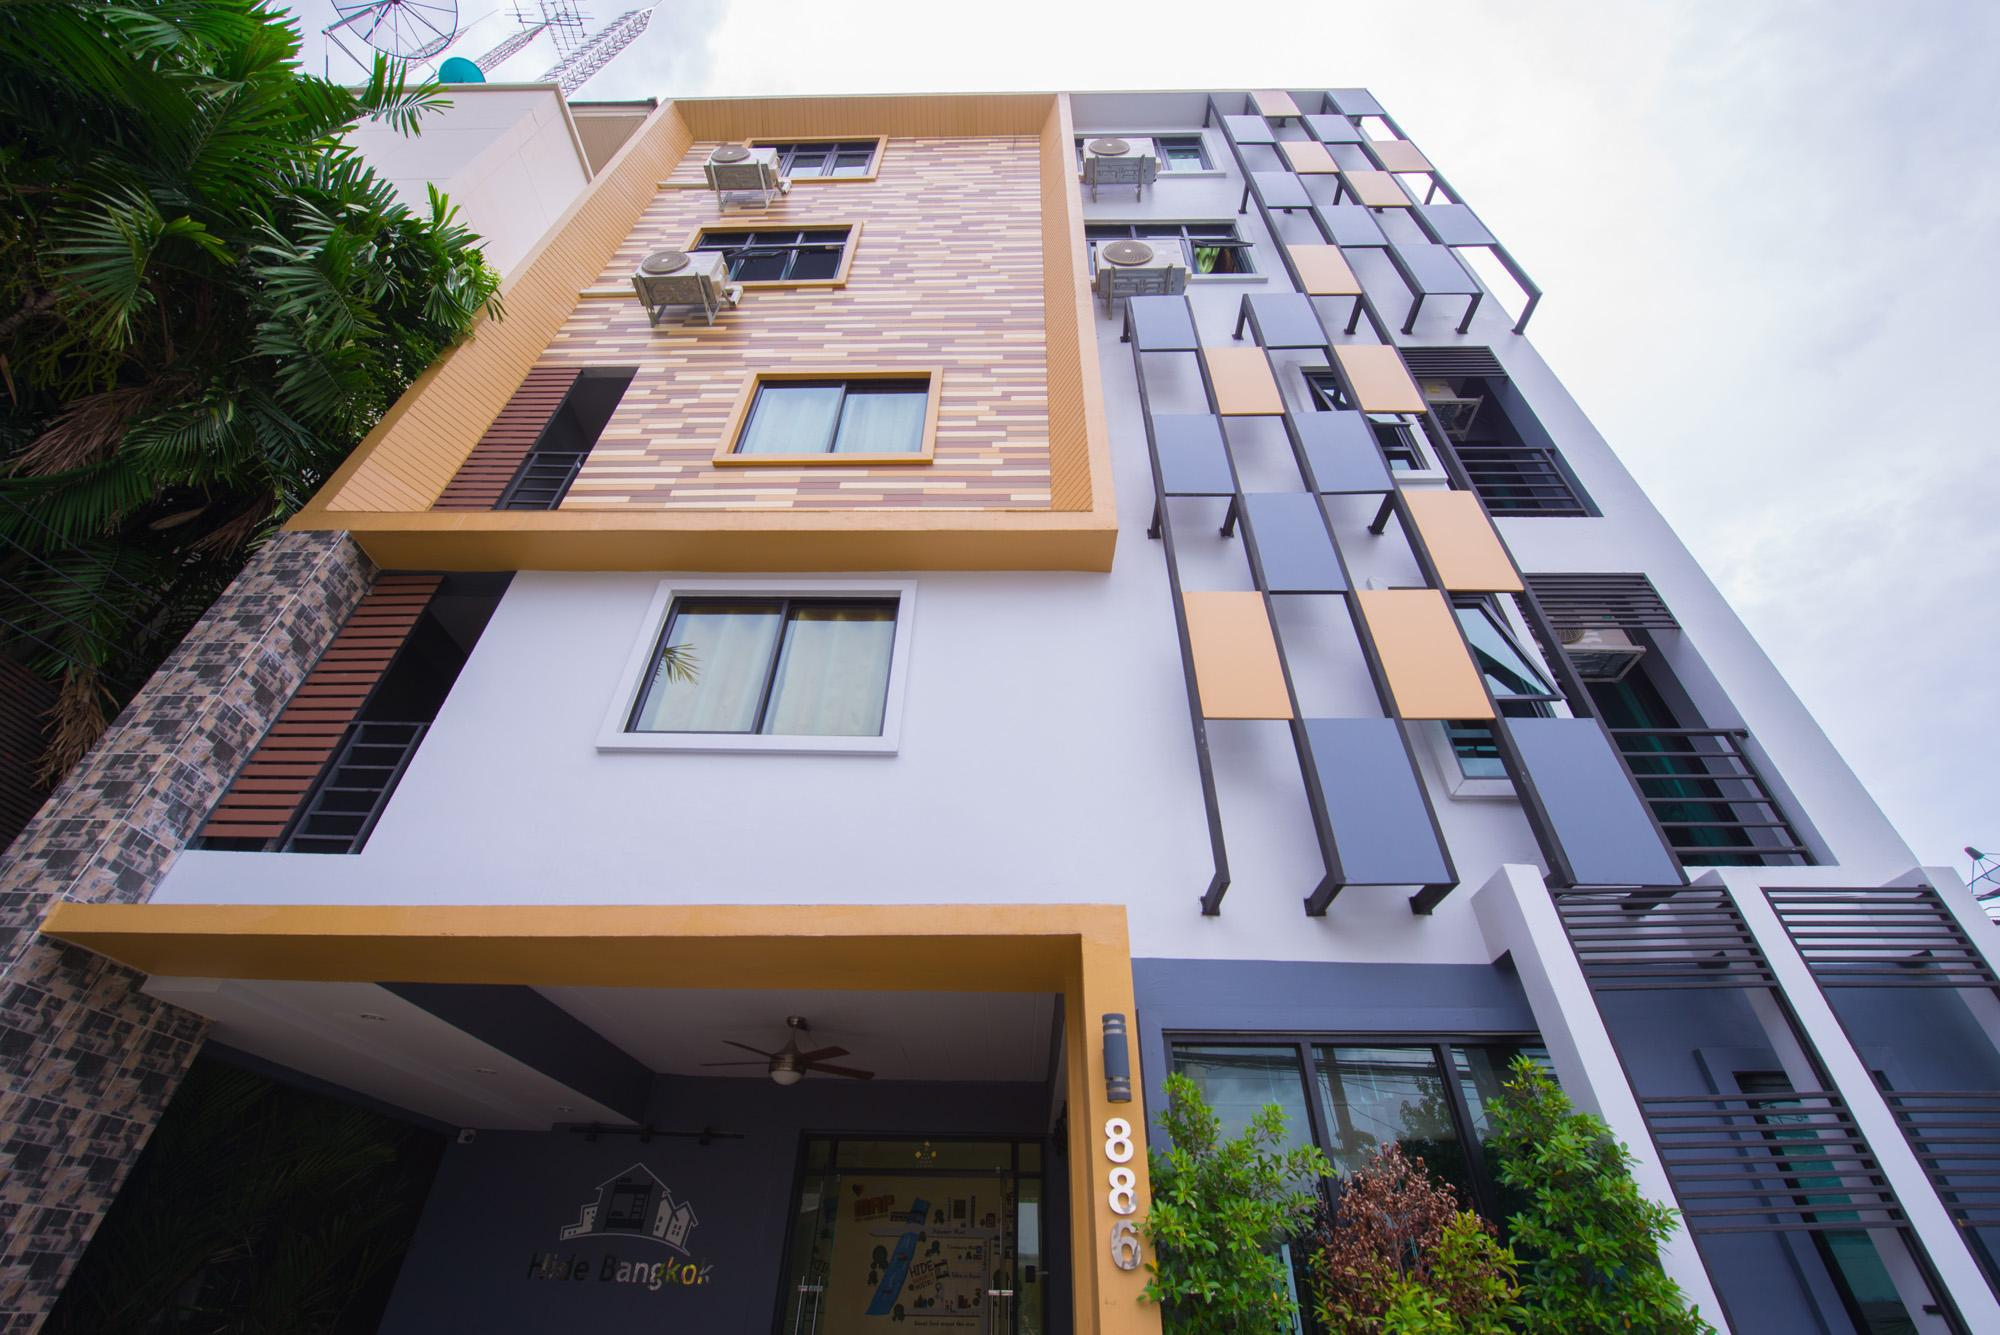 Hide Bangkok hostel ไฮ แบงค็อก โฮสเทล